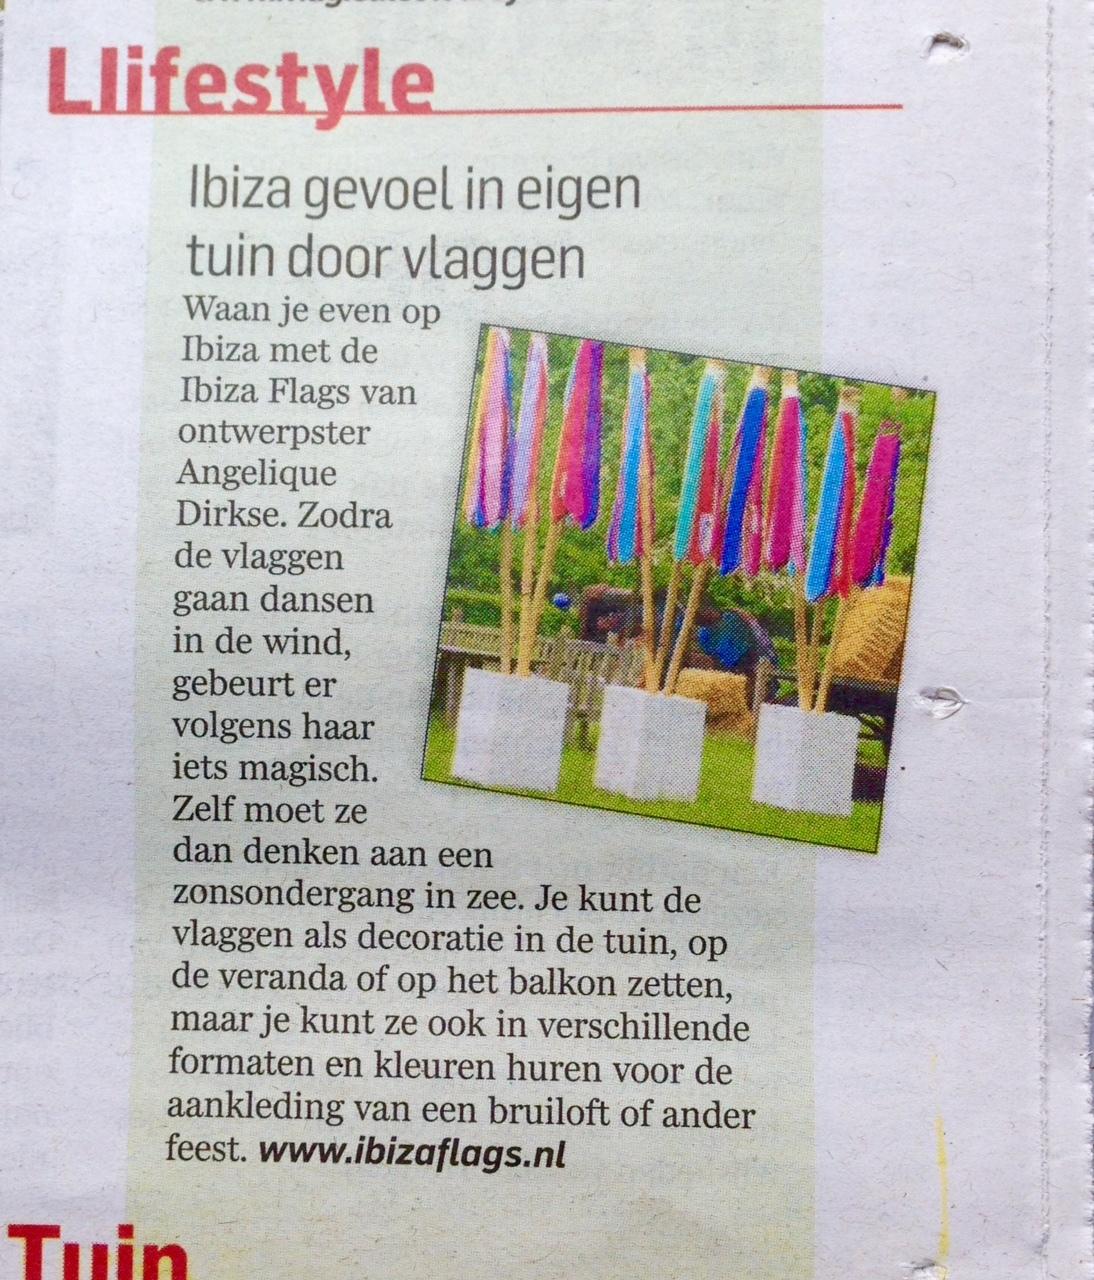 Ibiza vlaggen